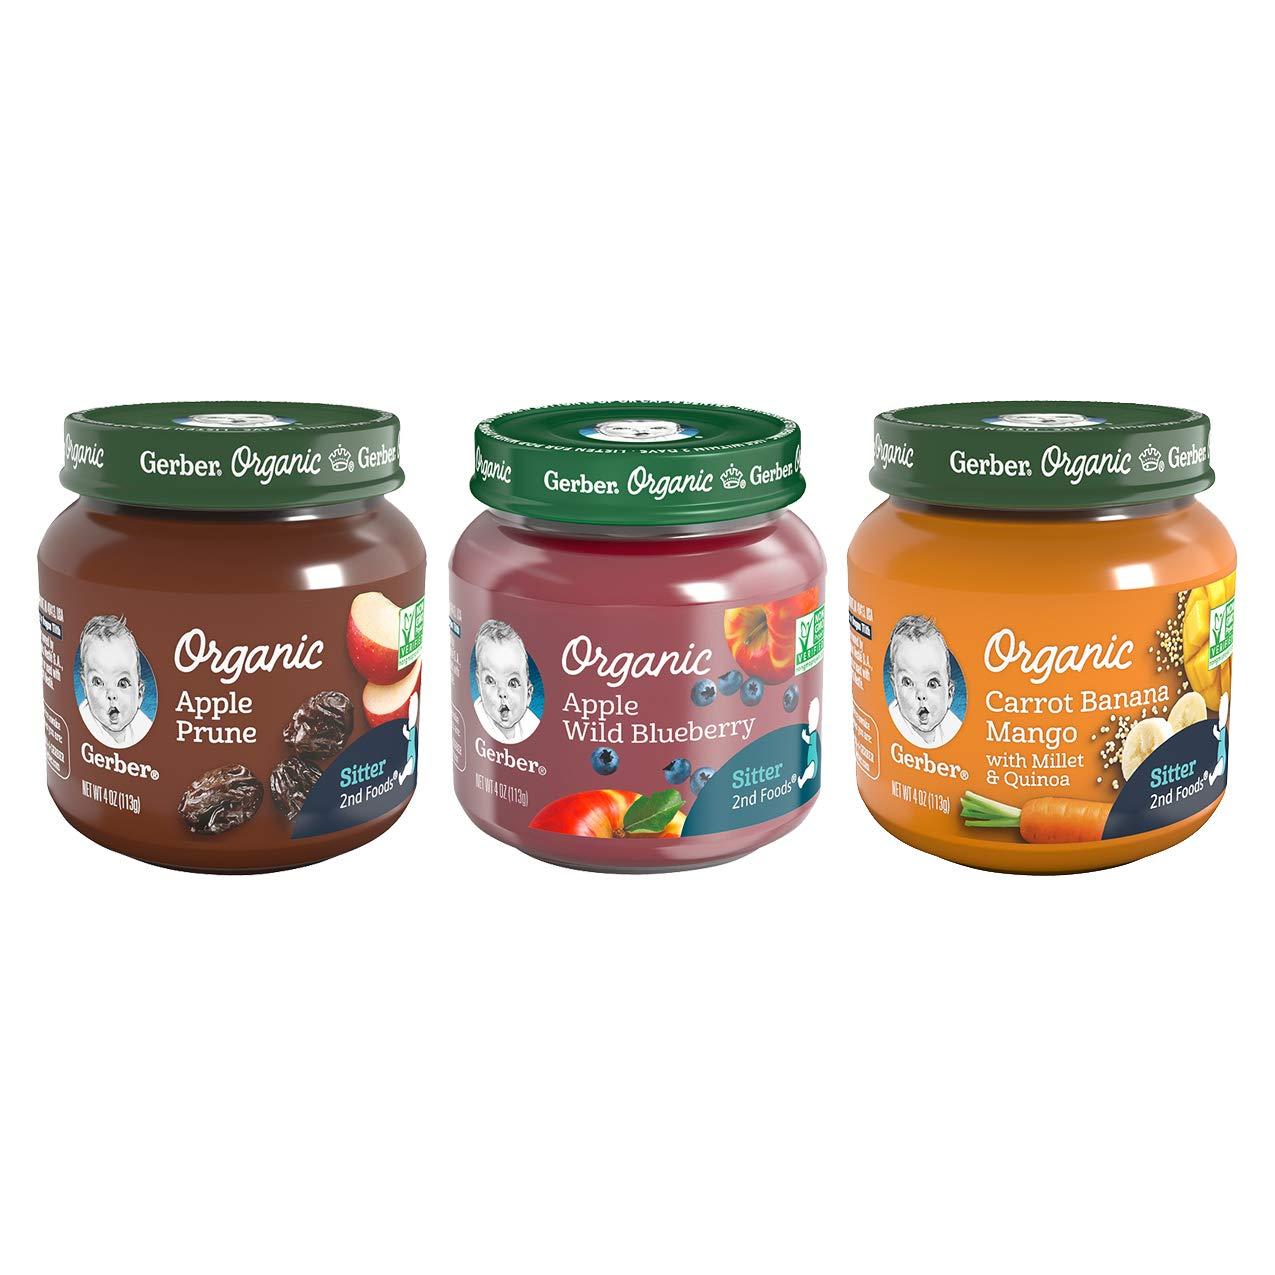 Gerber 2nd Foods Organic Jars Variety Pack, 4 Apple Prune, 4 Apple Wild Blueberry, 4 Carrot Banana Mango, 12-CT